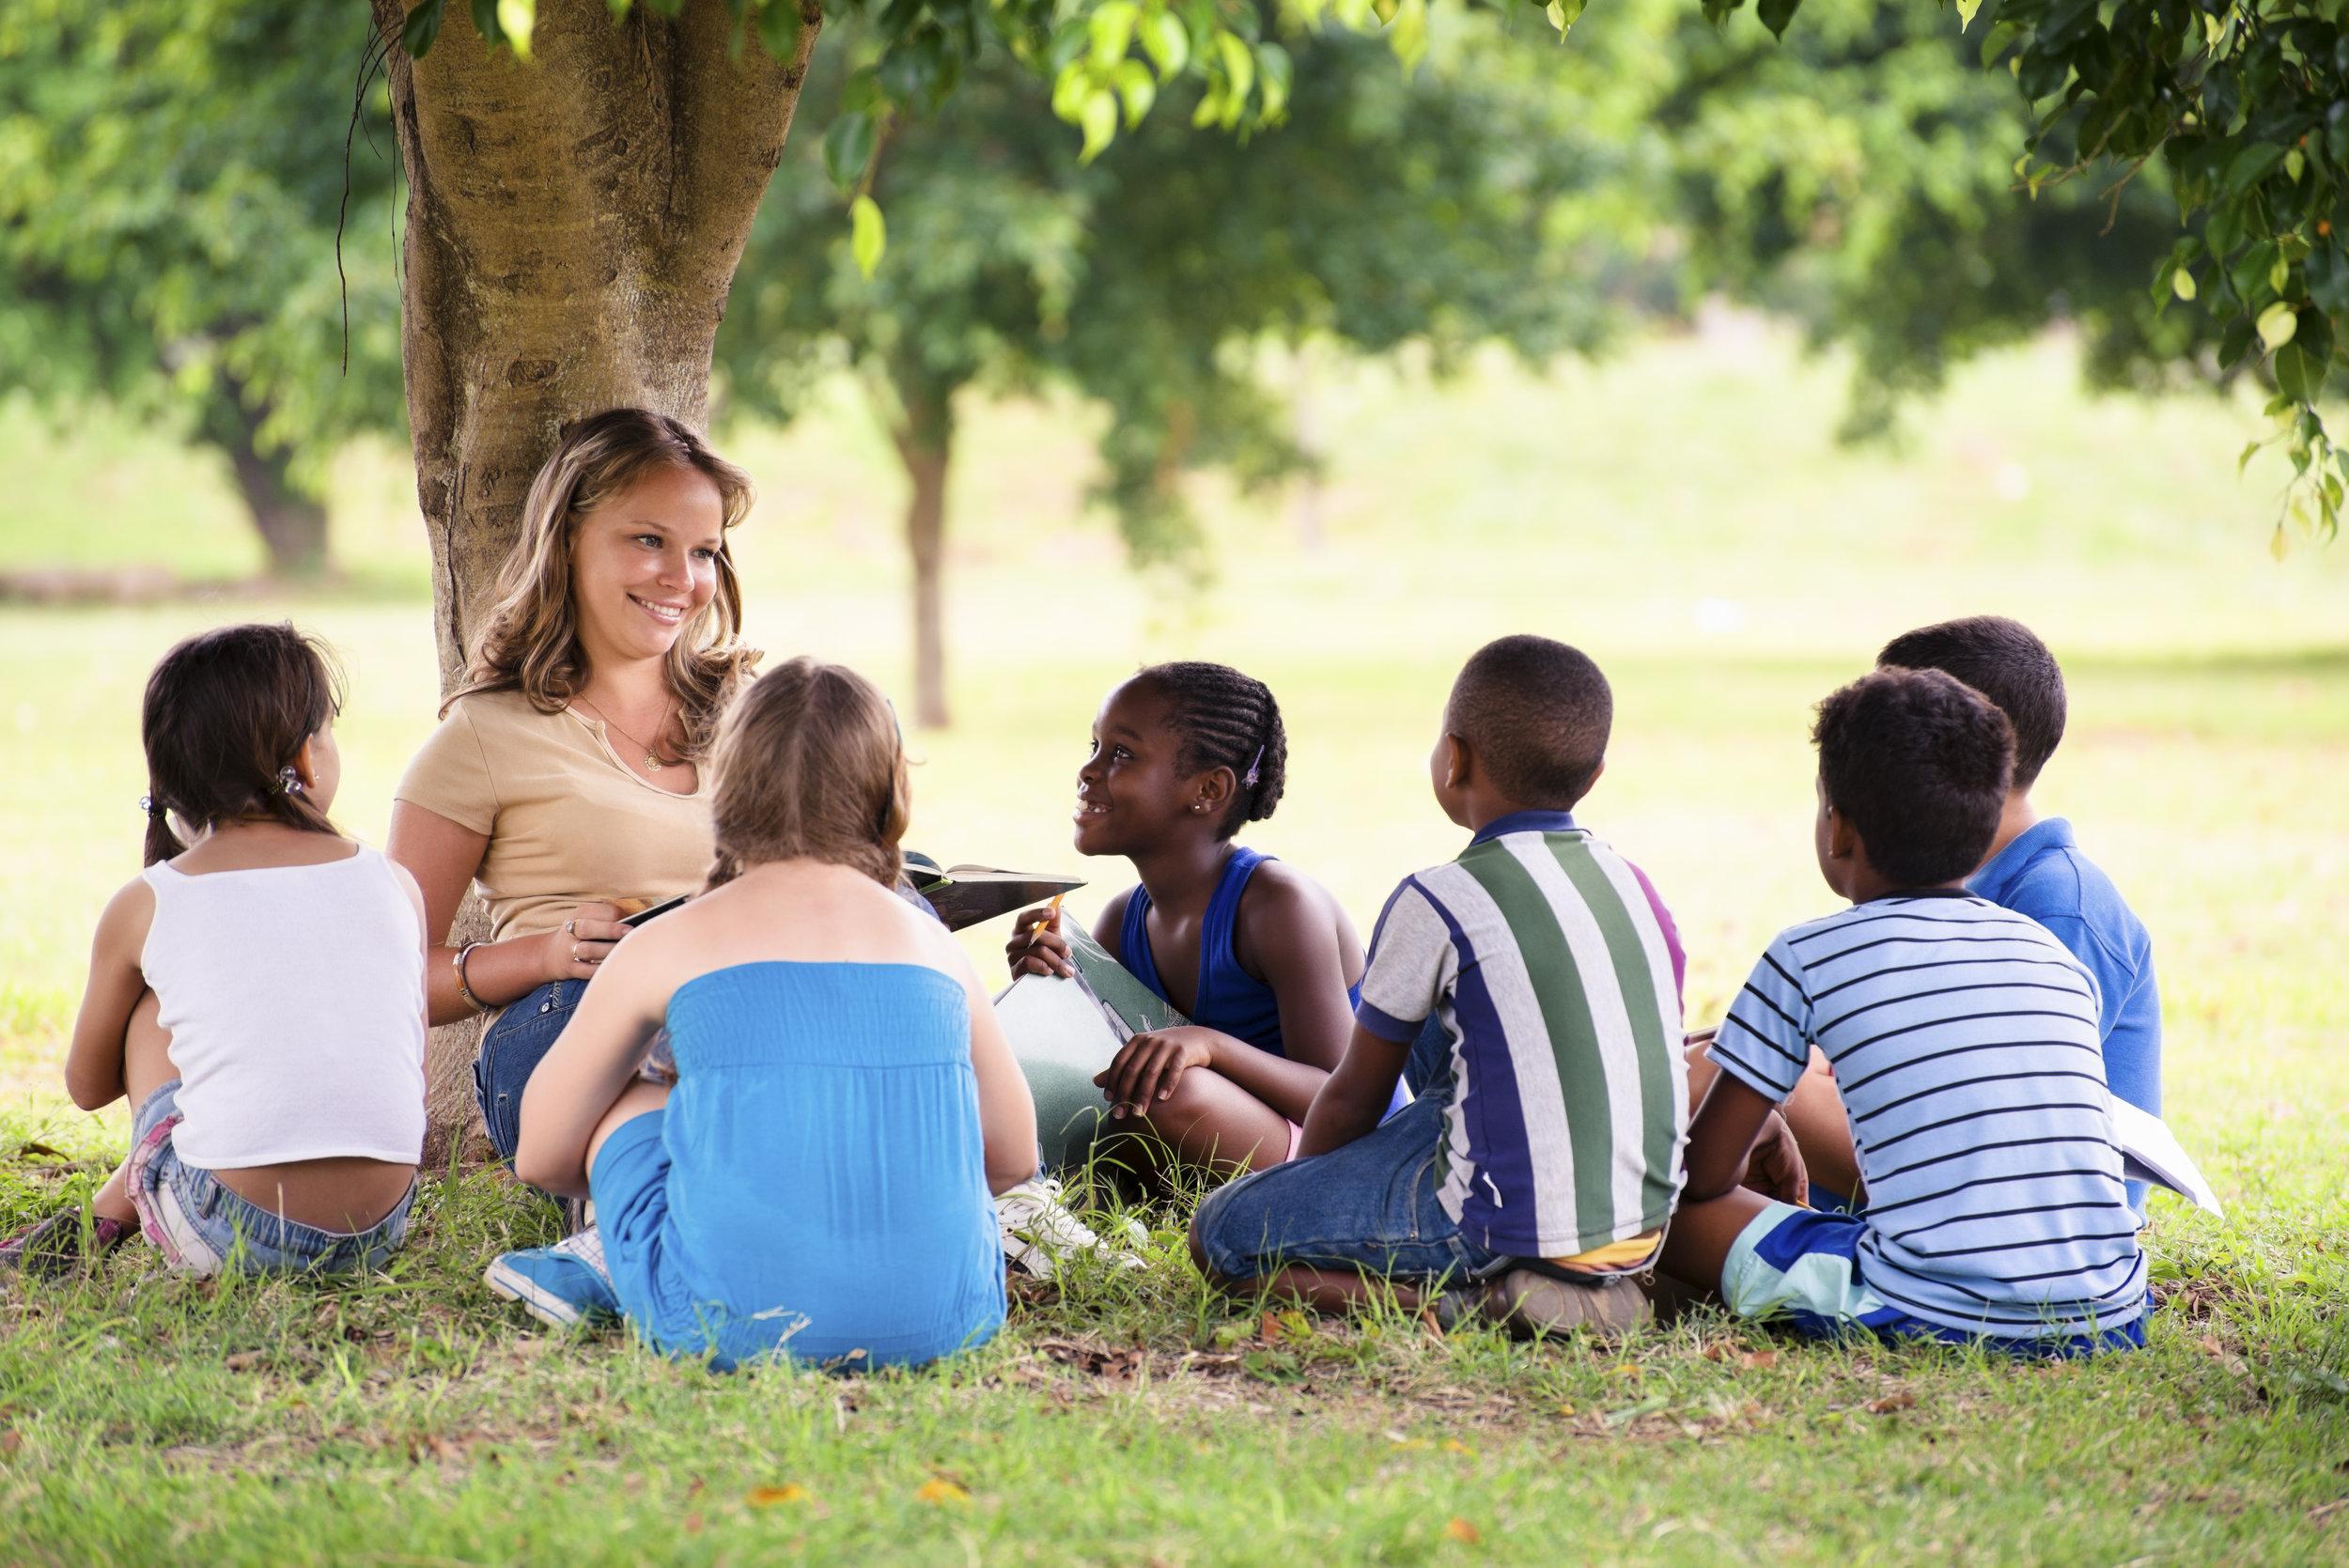 children-and-education-teacher-reading-book-to-PGWAPN8.jpg